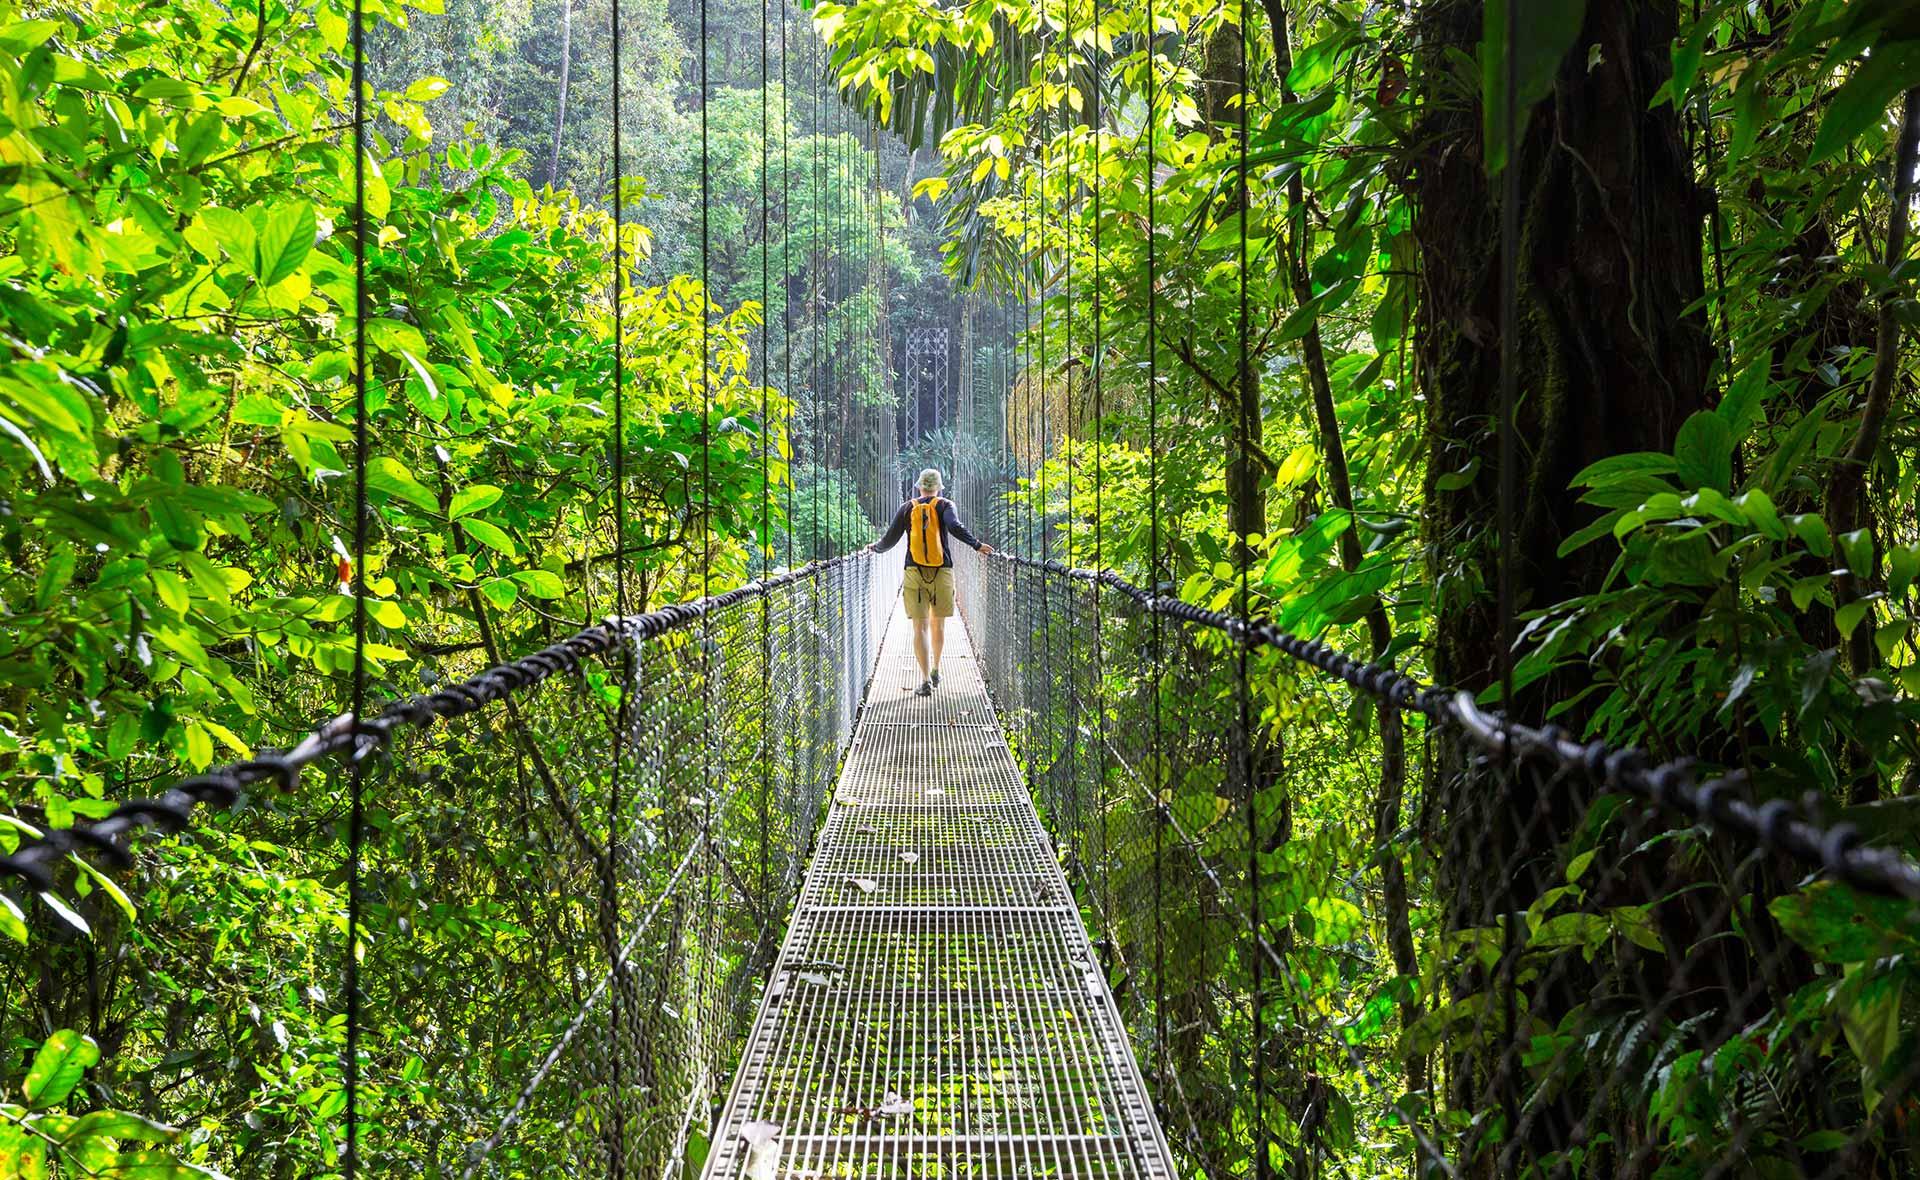 BBVA-turismo-ecologico-respeto-medioambiente-turistas-extranjeros-proteccion-planeta